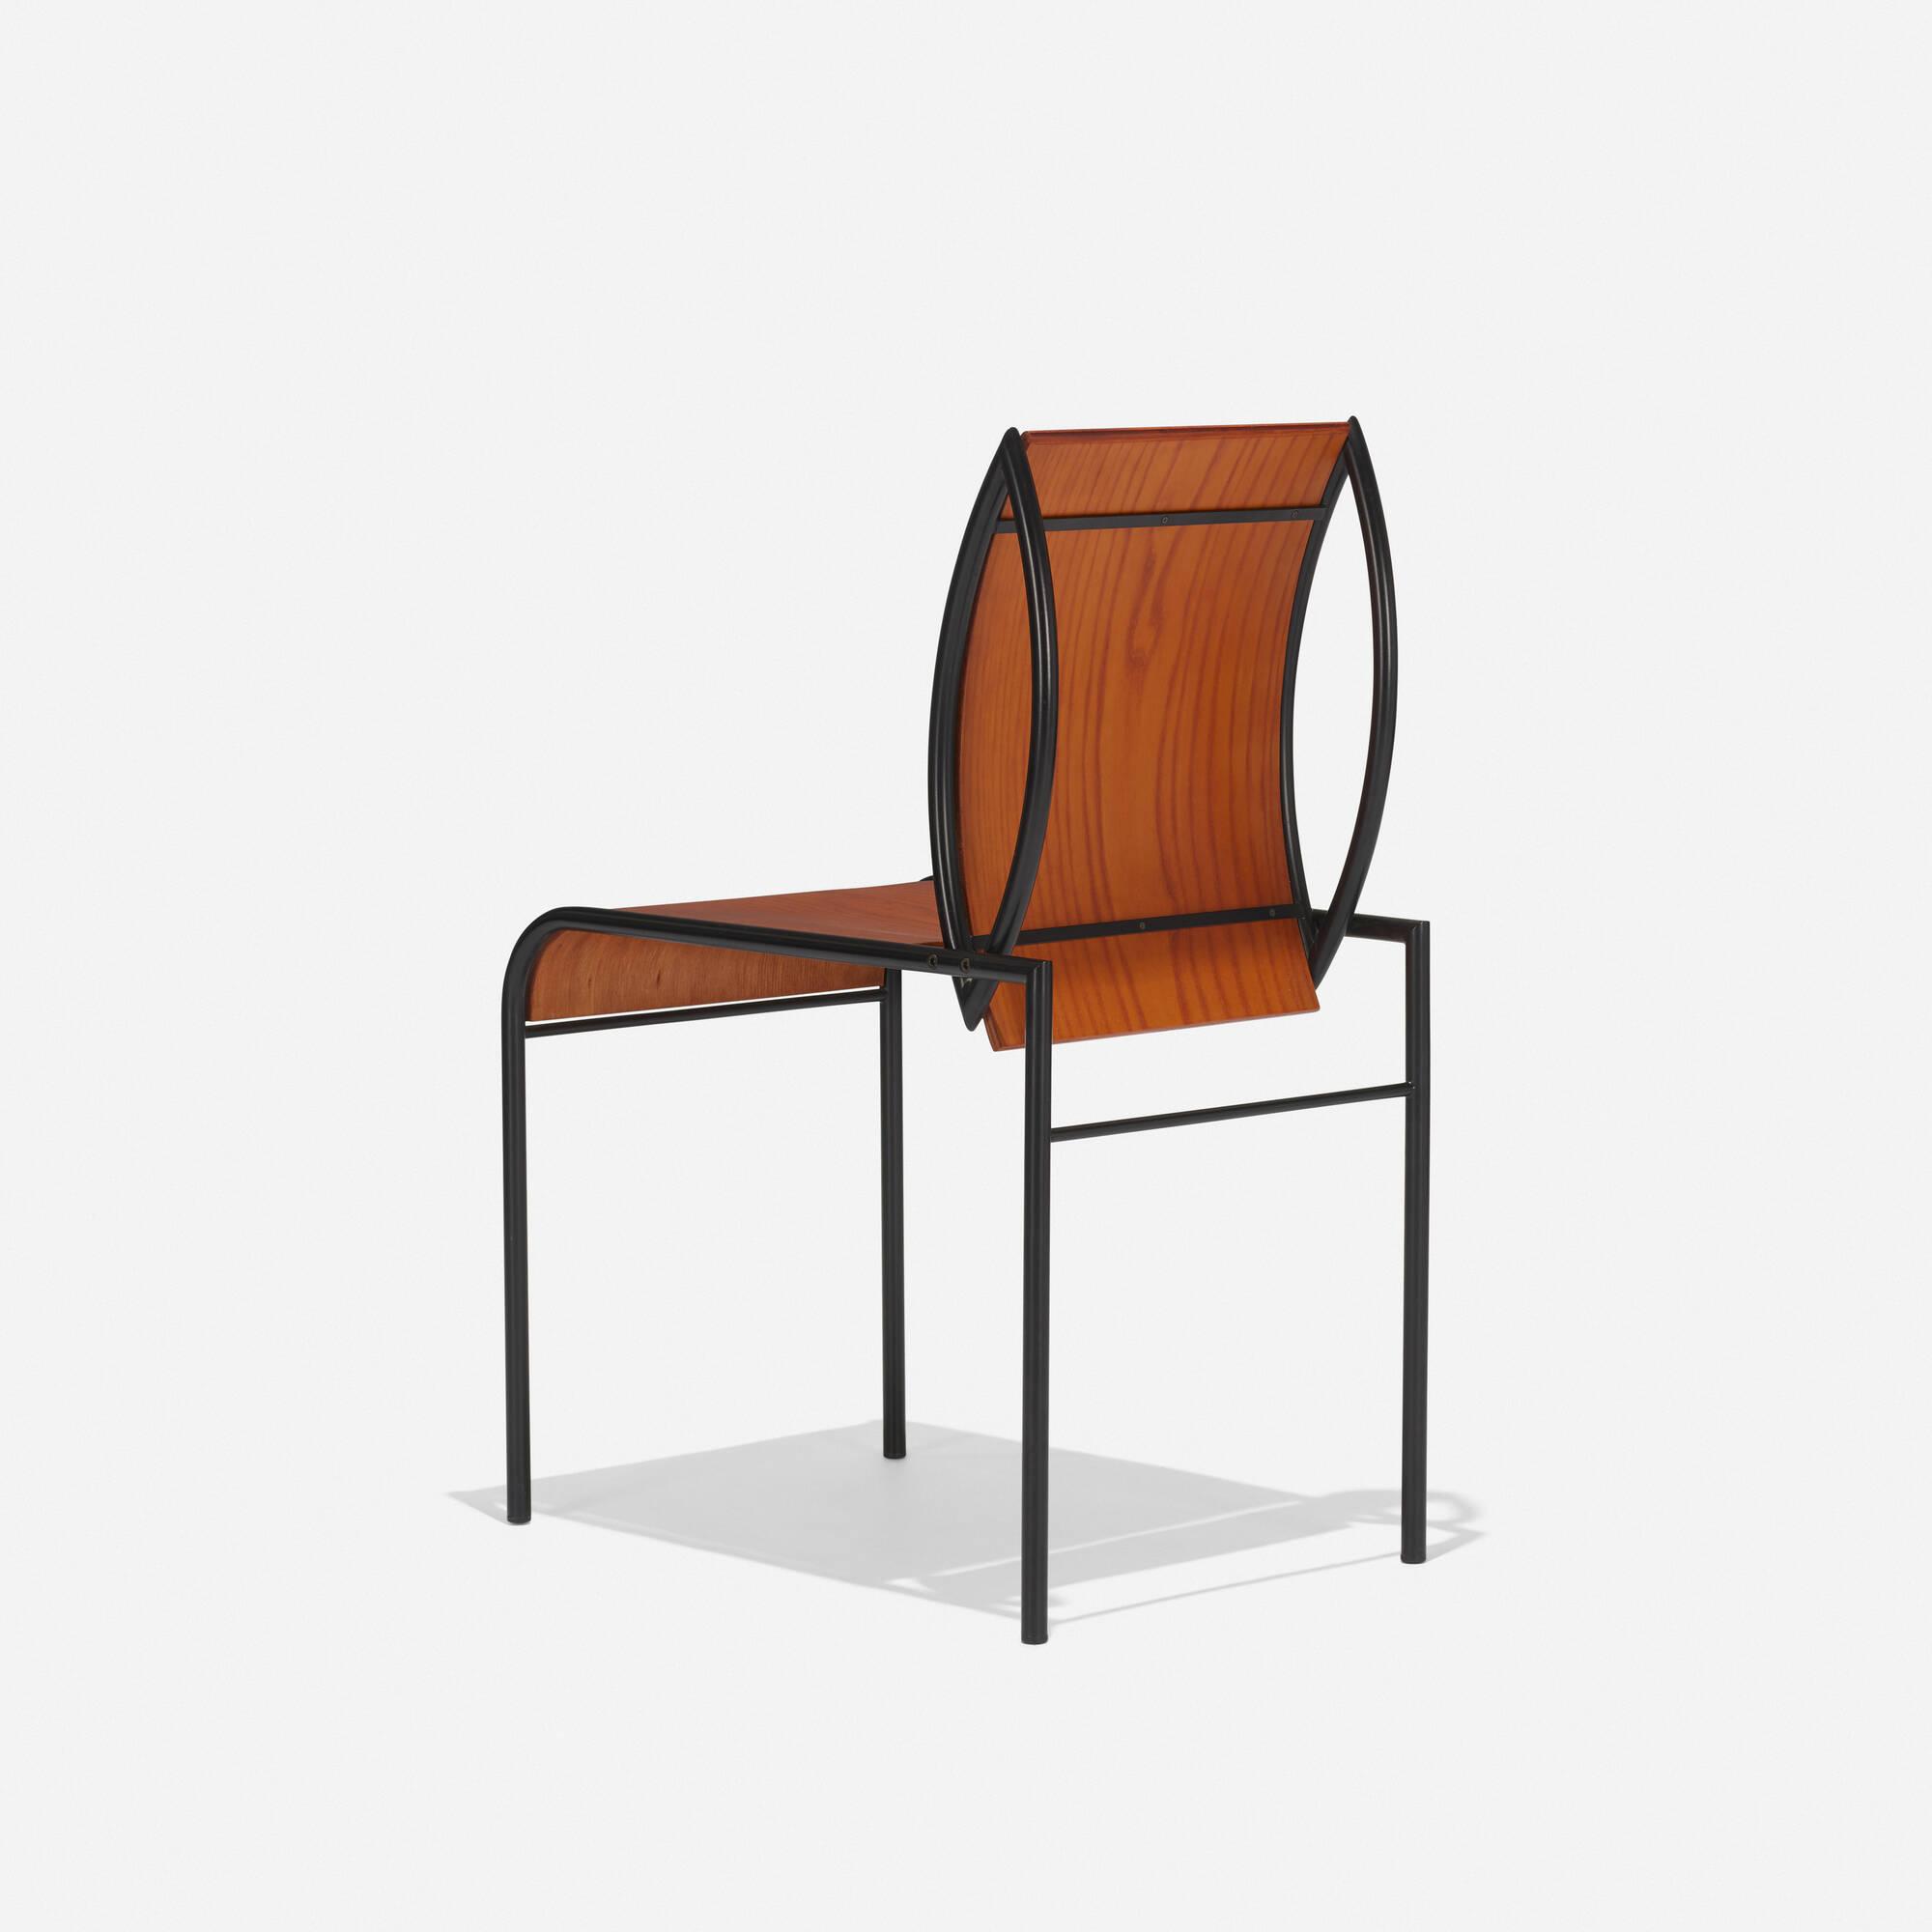 402: Michele De Lucchi / Kim chair (1 of 3)